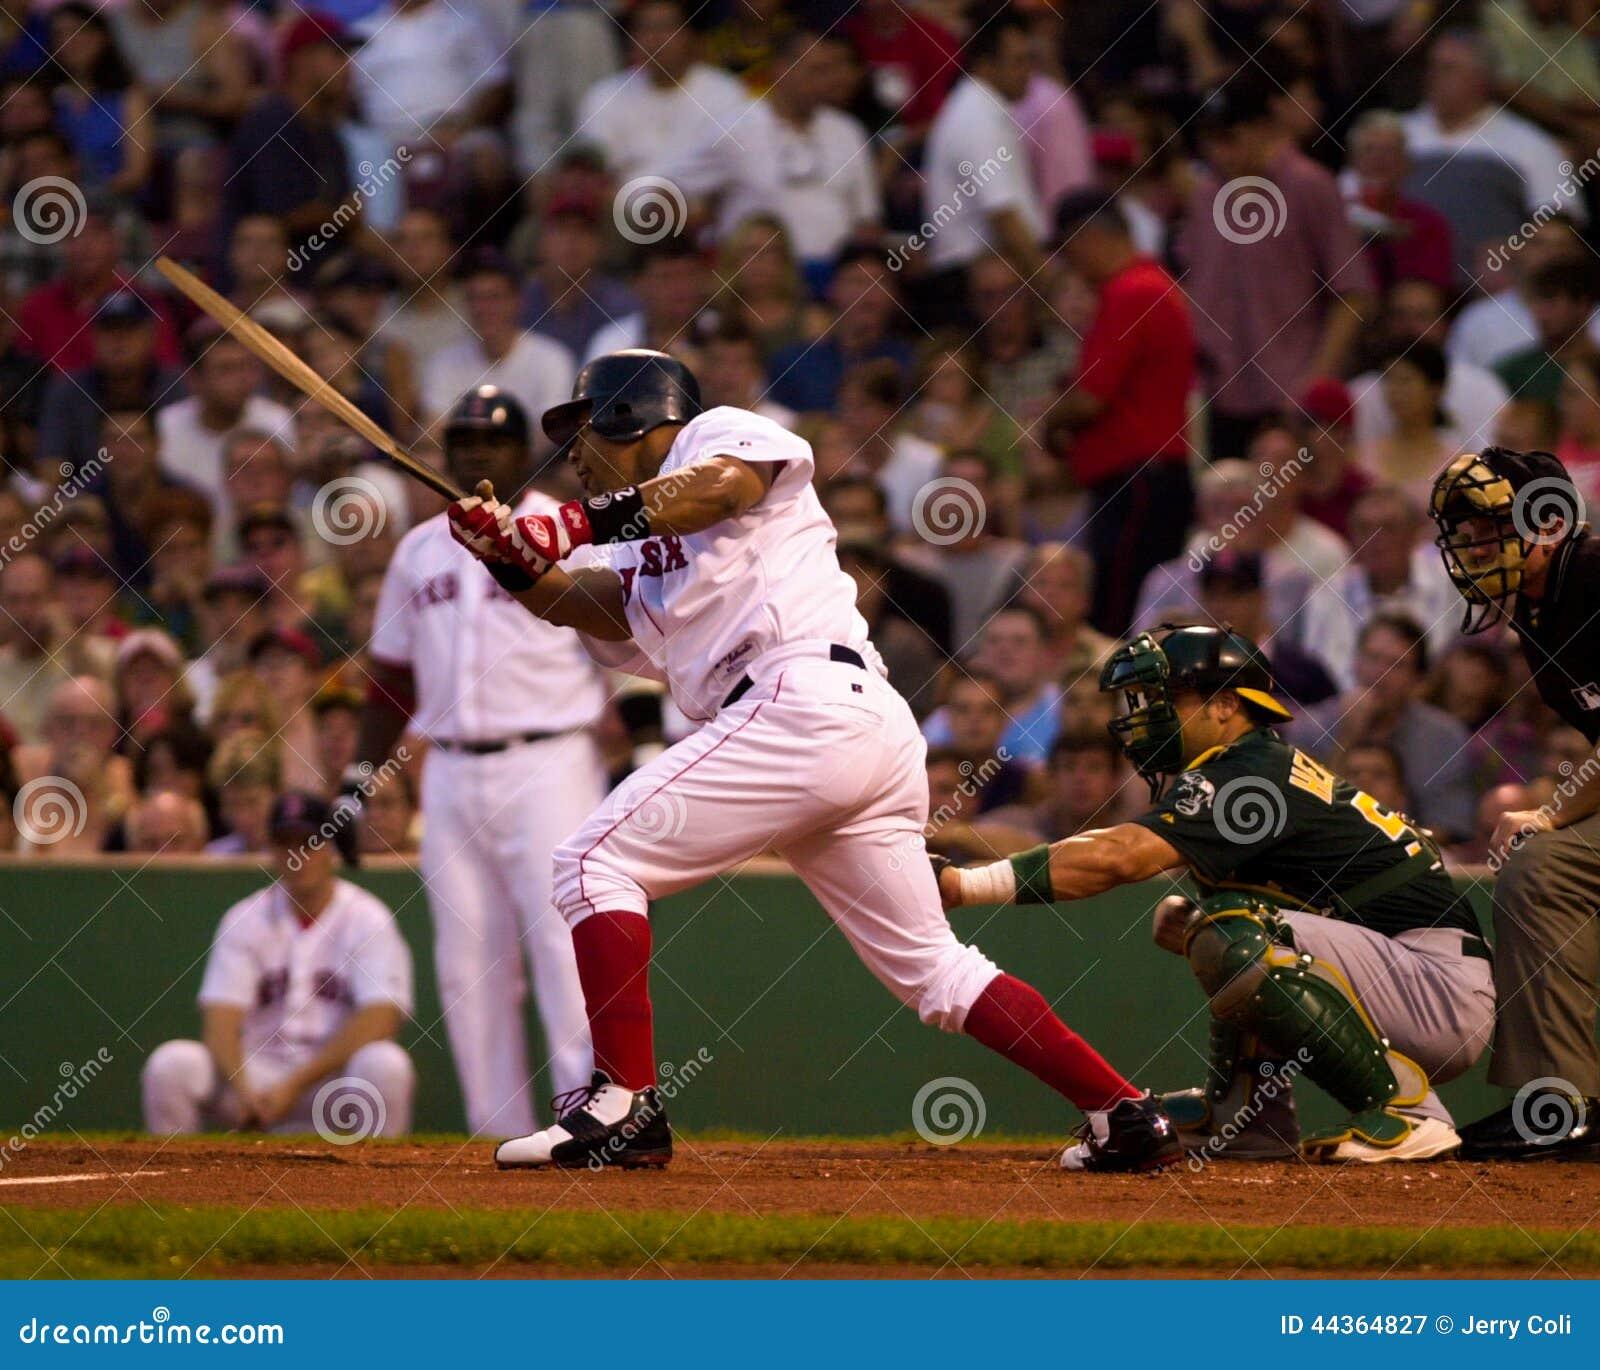 Manny Ramirez, Boston Red Sox